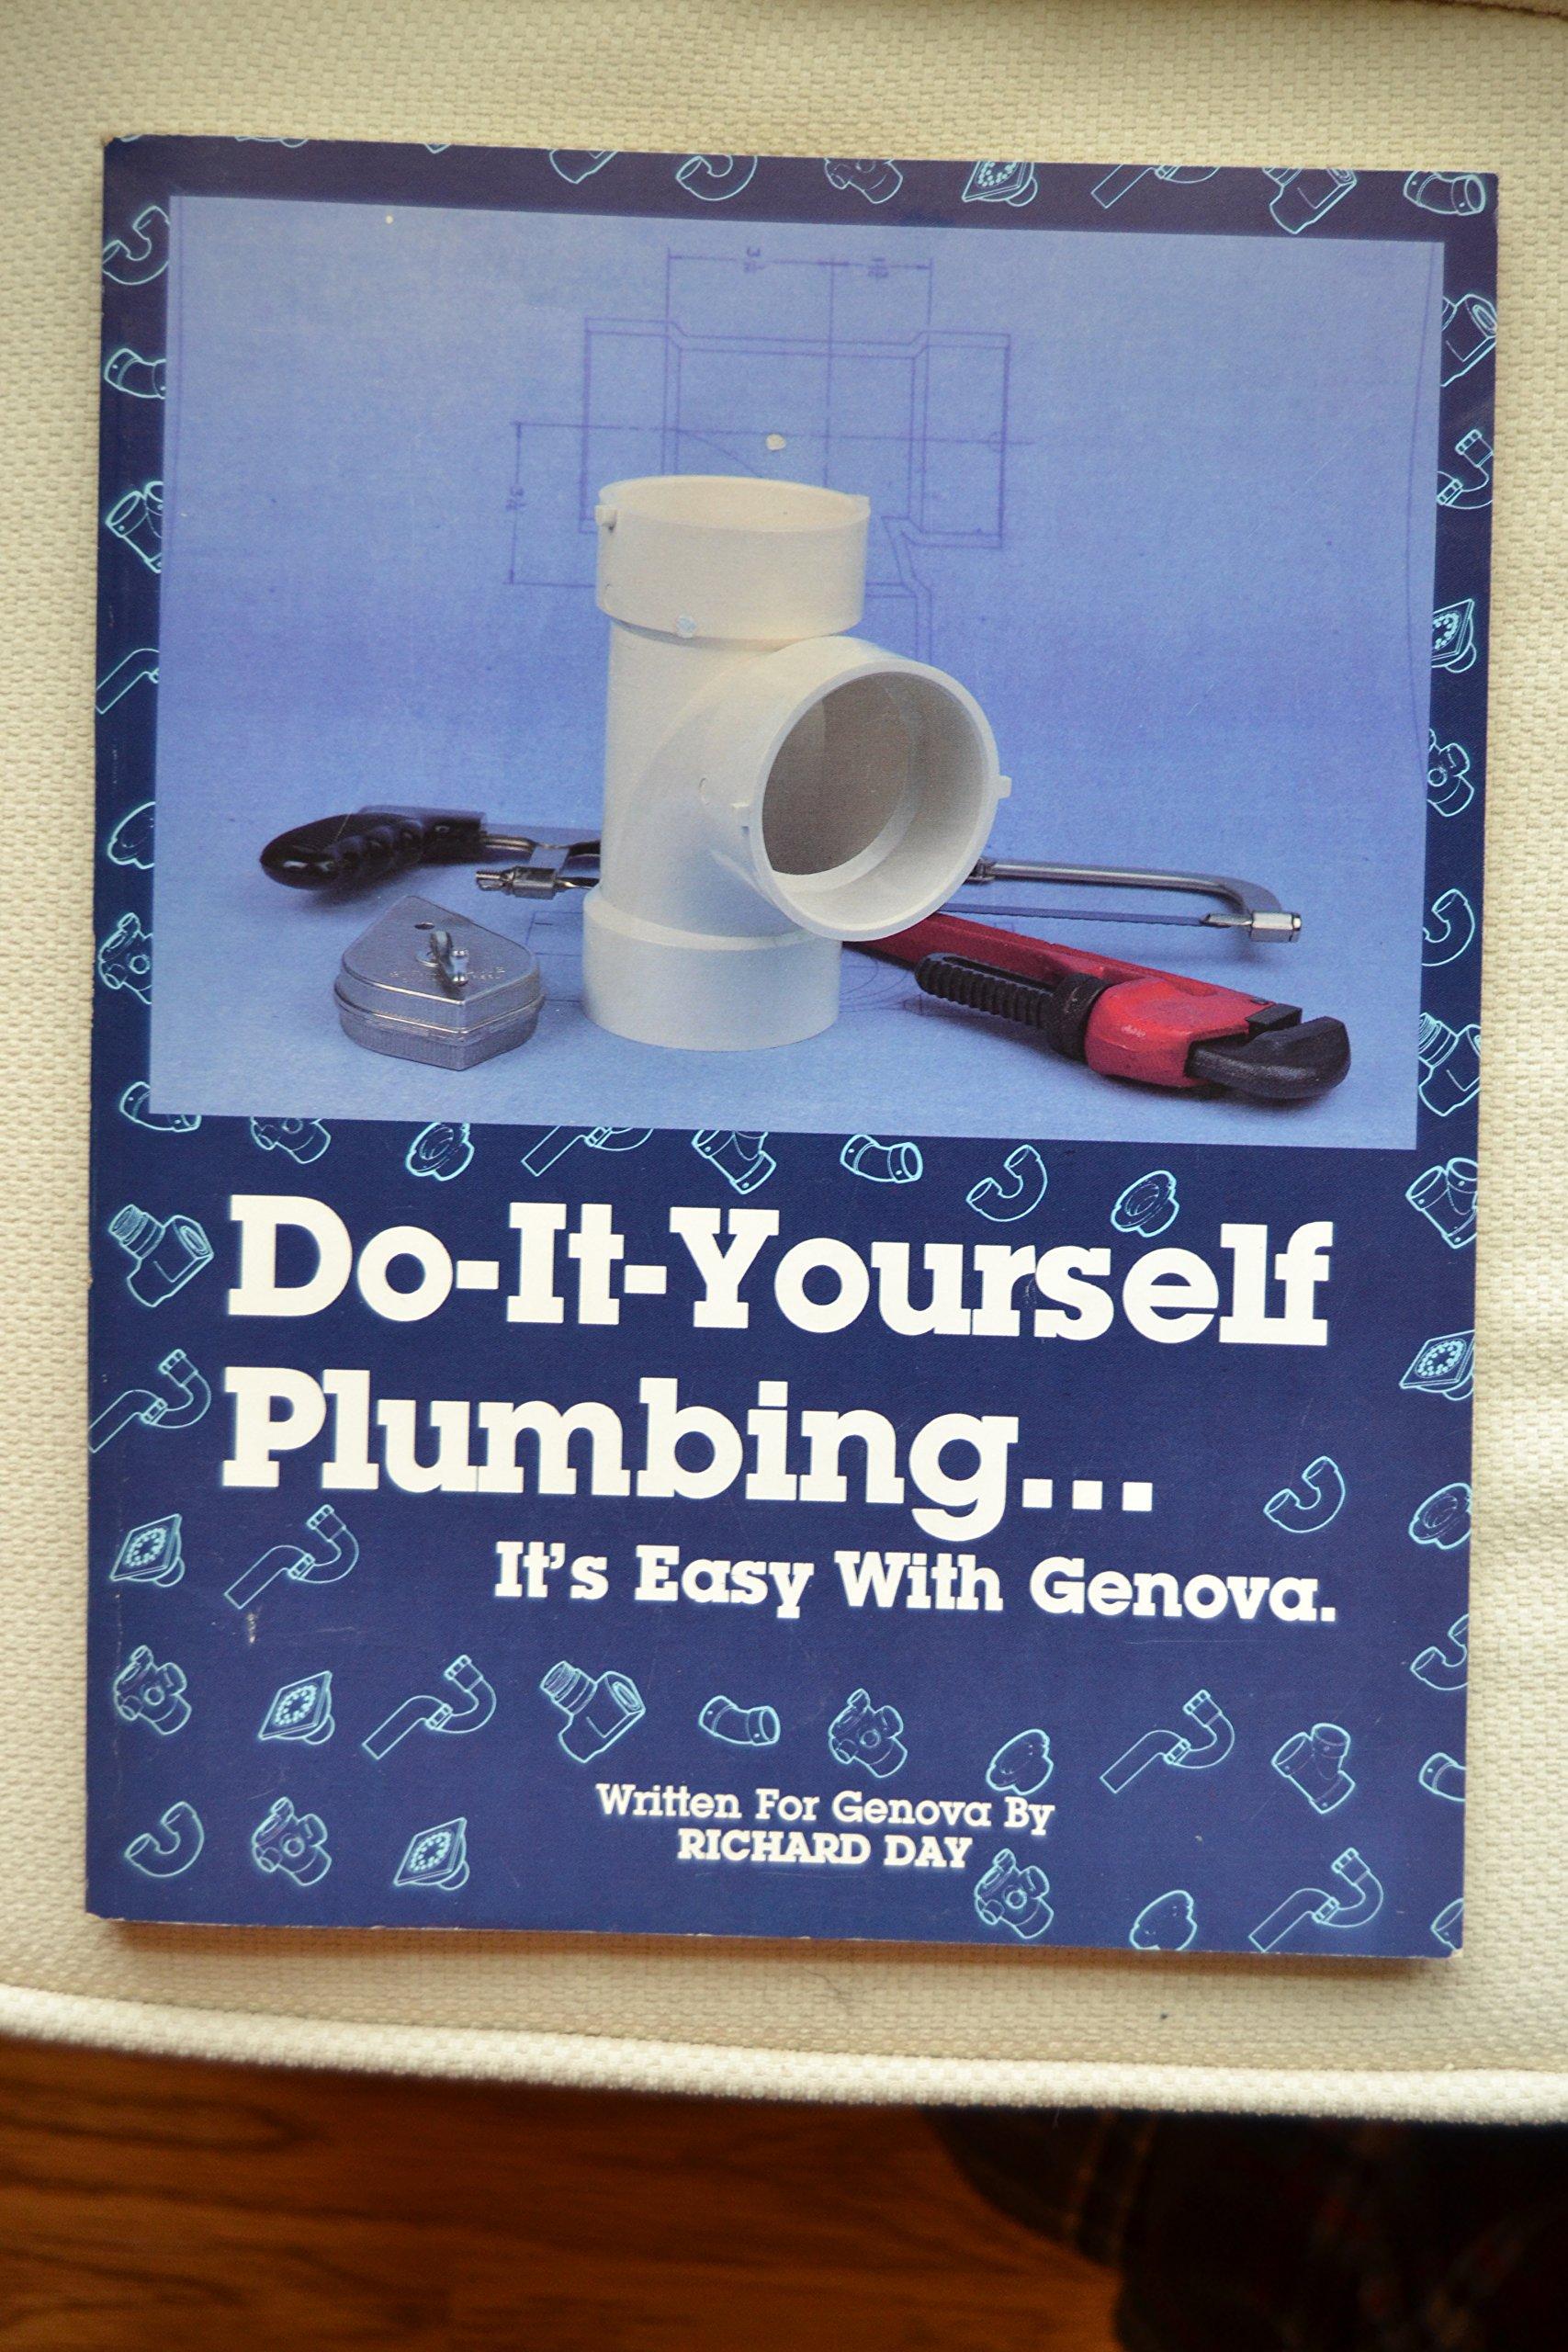 Do it yourself plumbing richard day 9780961650902 amazon books solutioingenieria Choice Image